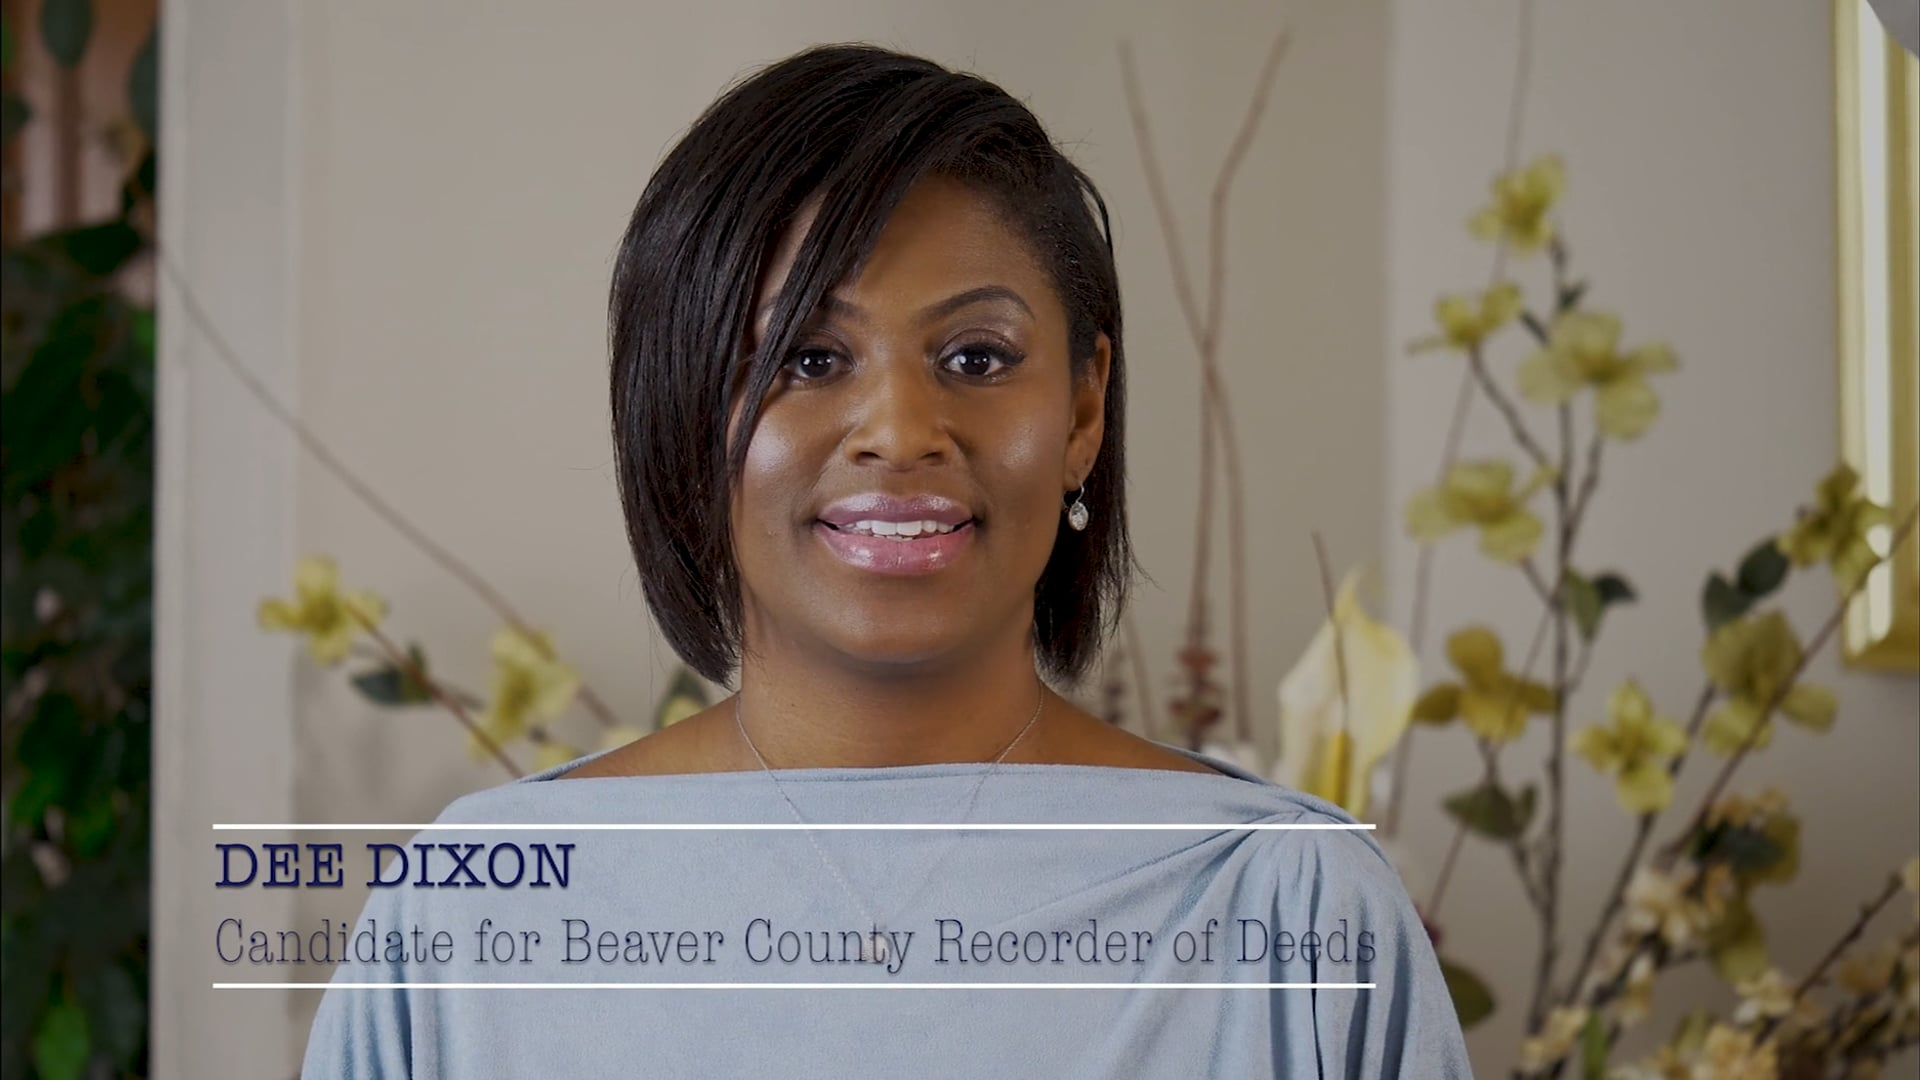 Campaign Video_Dee Dixon_Recorder of Deeds (D)